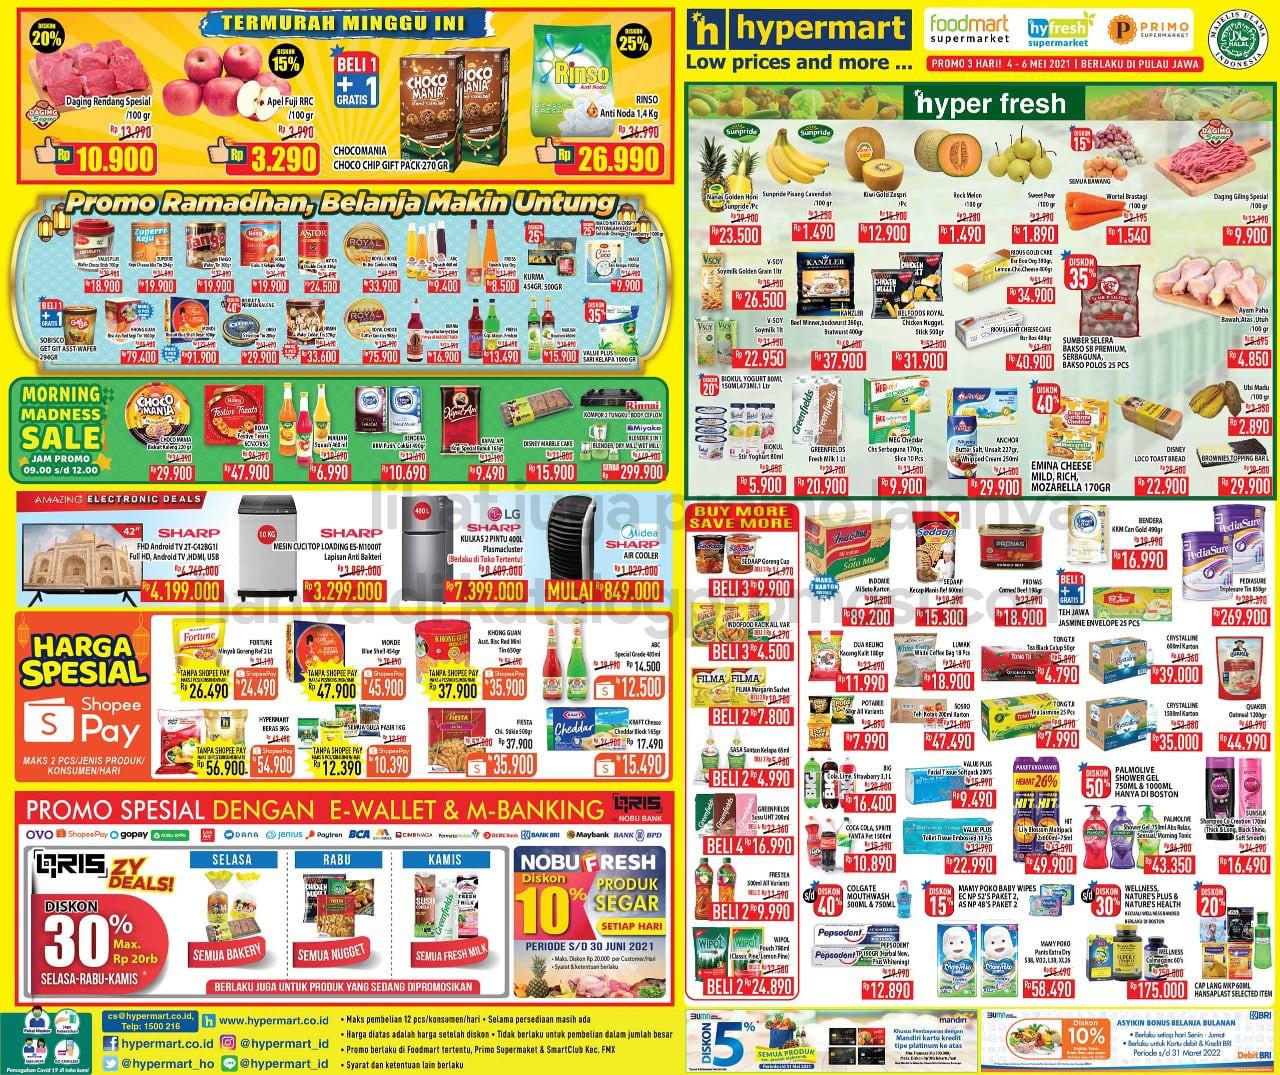 Katalog Hypermart Promo Weekday periode 04-06 Mei 2021